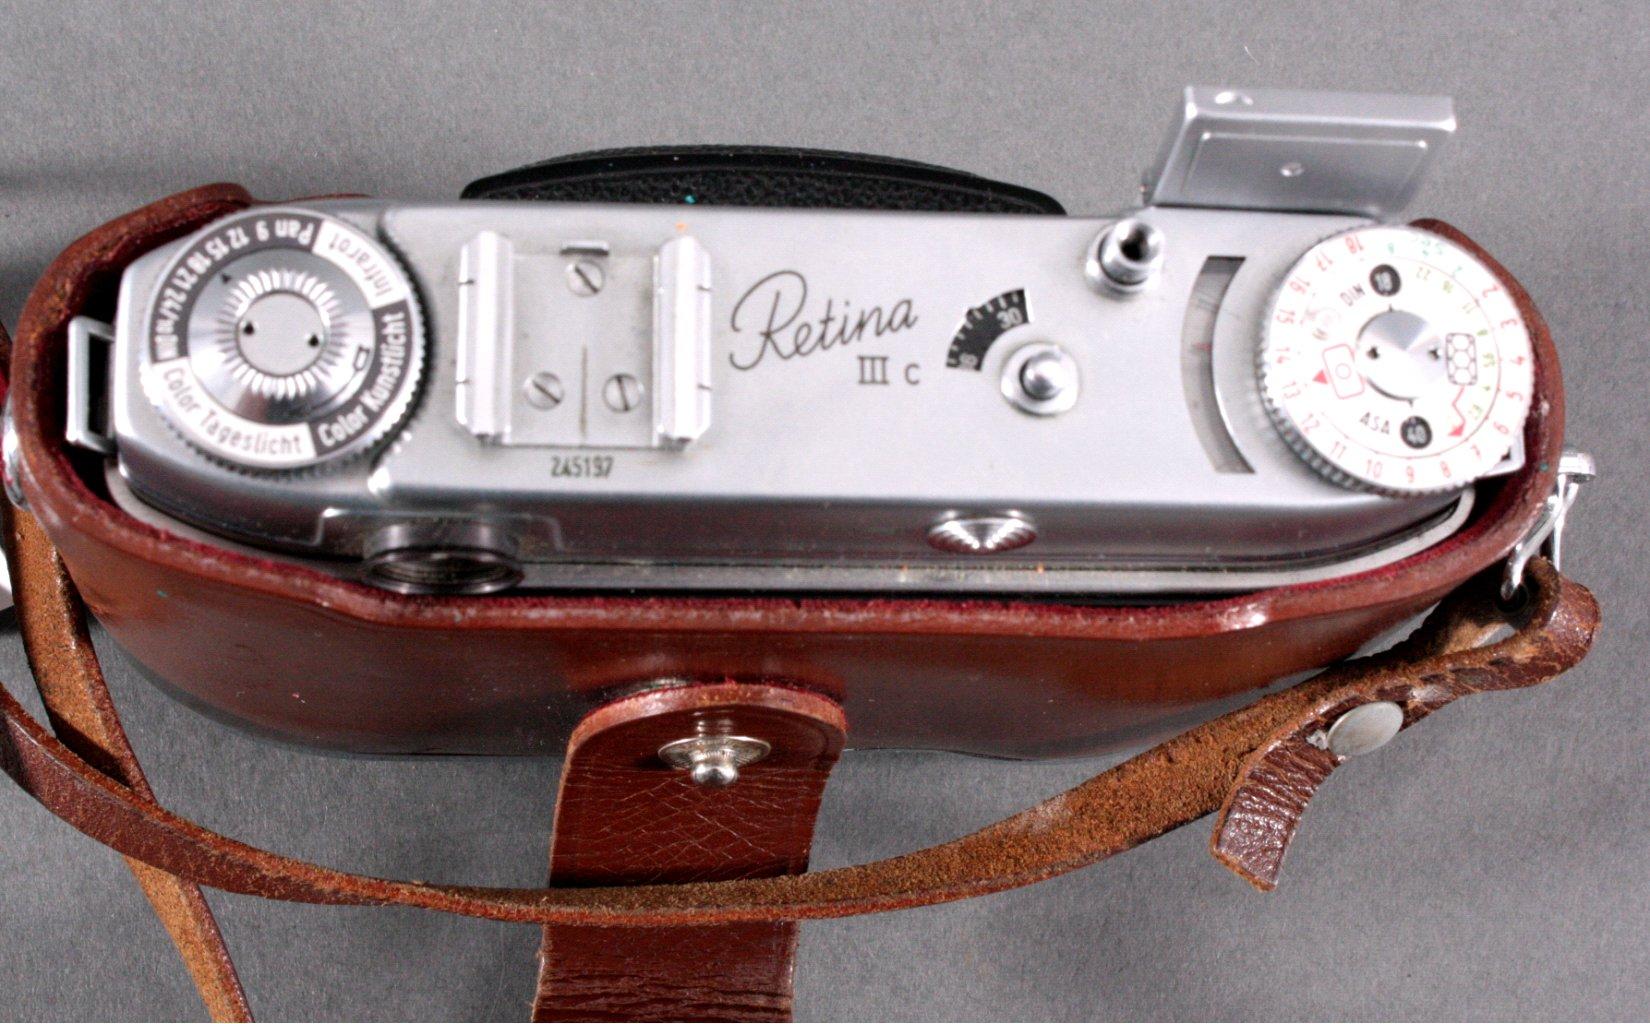 Kodak Retina IIIc Kamera-1